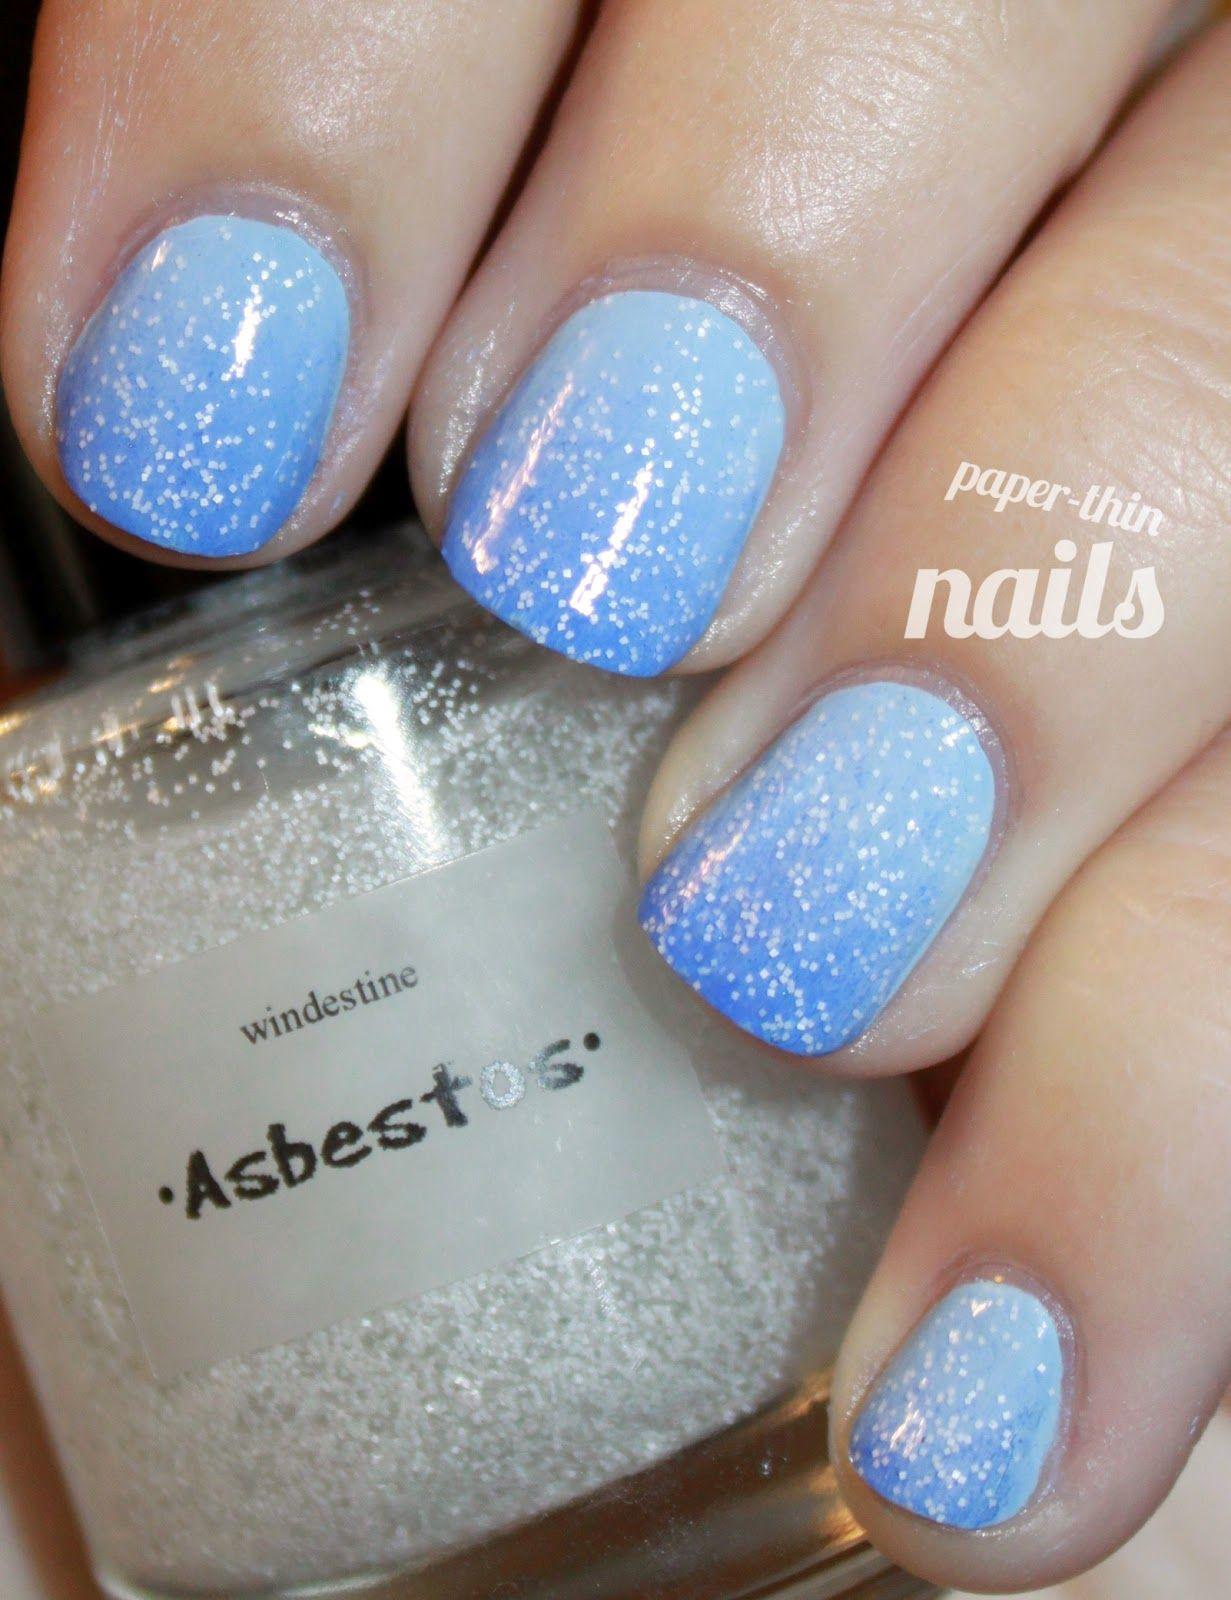 paper thin nails: Ombré Hombre   Nail Art   Pinterest   Thin nails ...